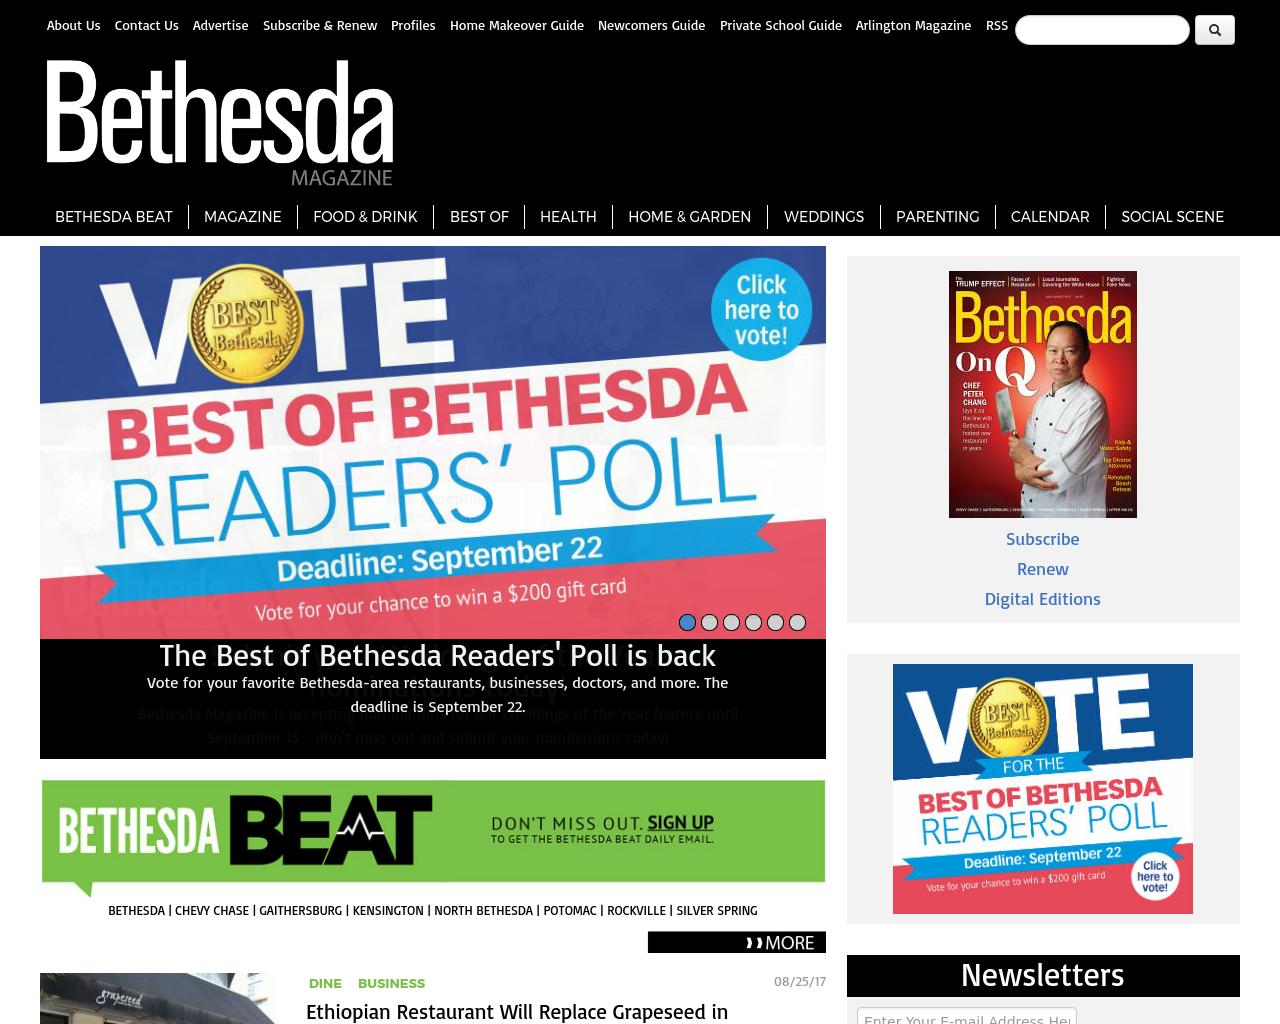 Bethesda-Magazine-Advertising-Reviews-Pricing